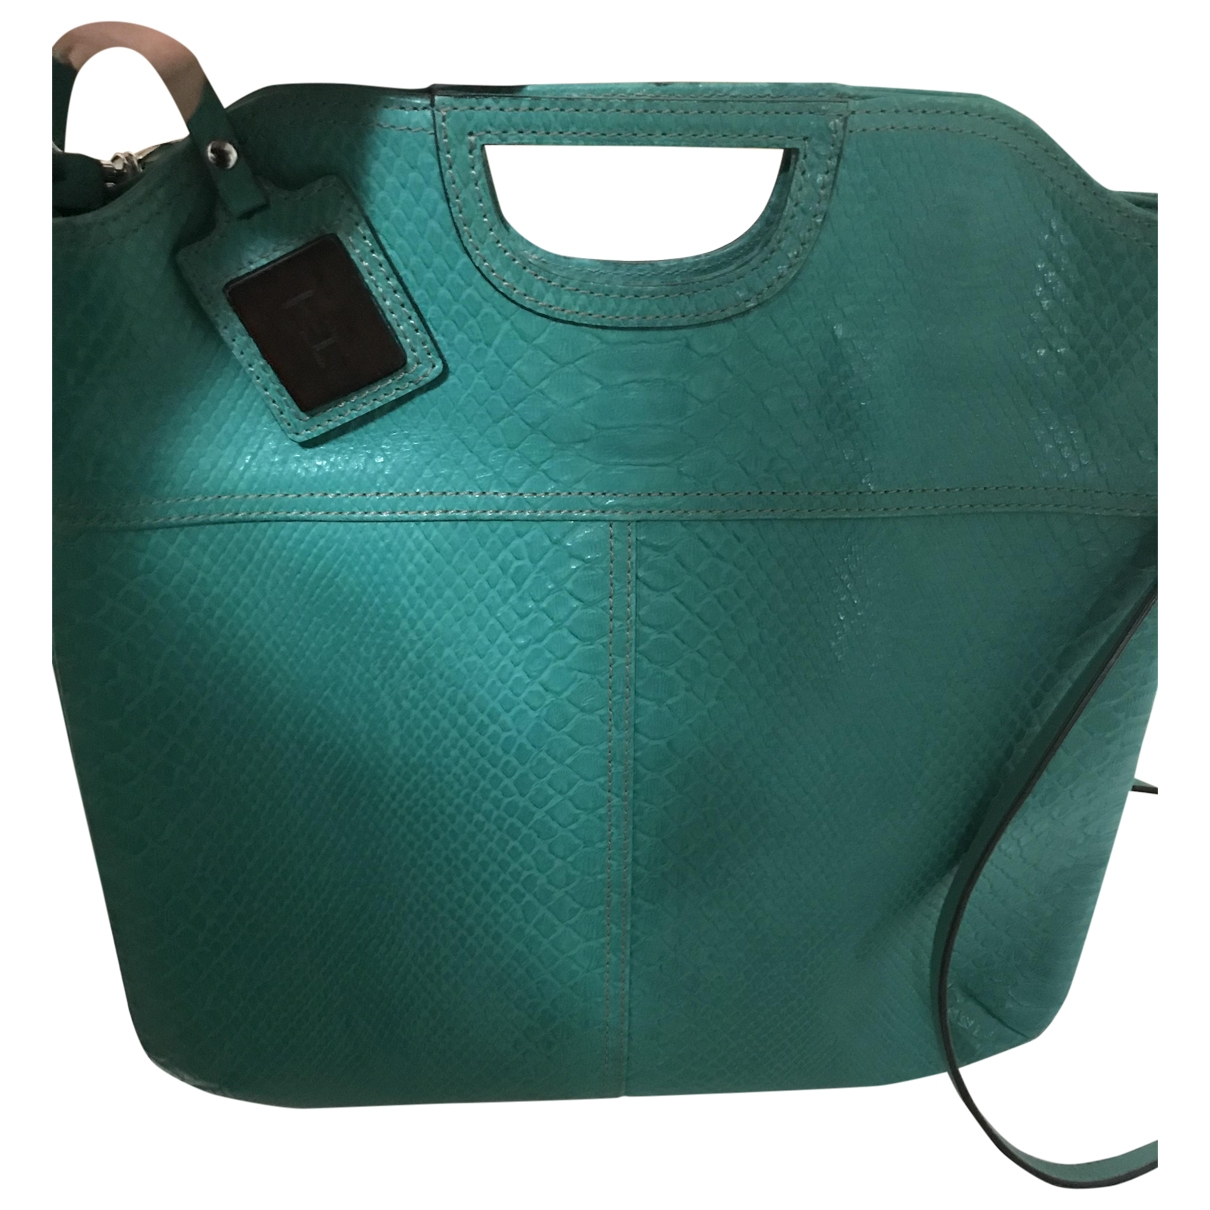 Tommy Hilfiger \N Handtasche in  Gruen Leder